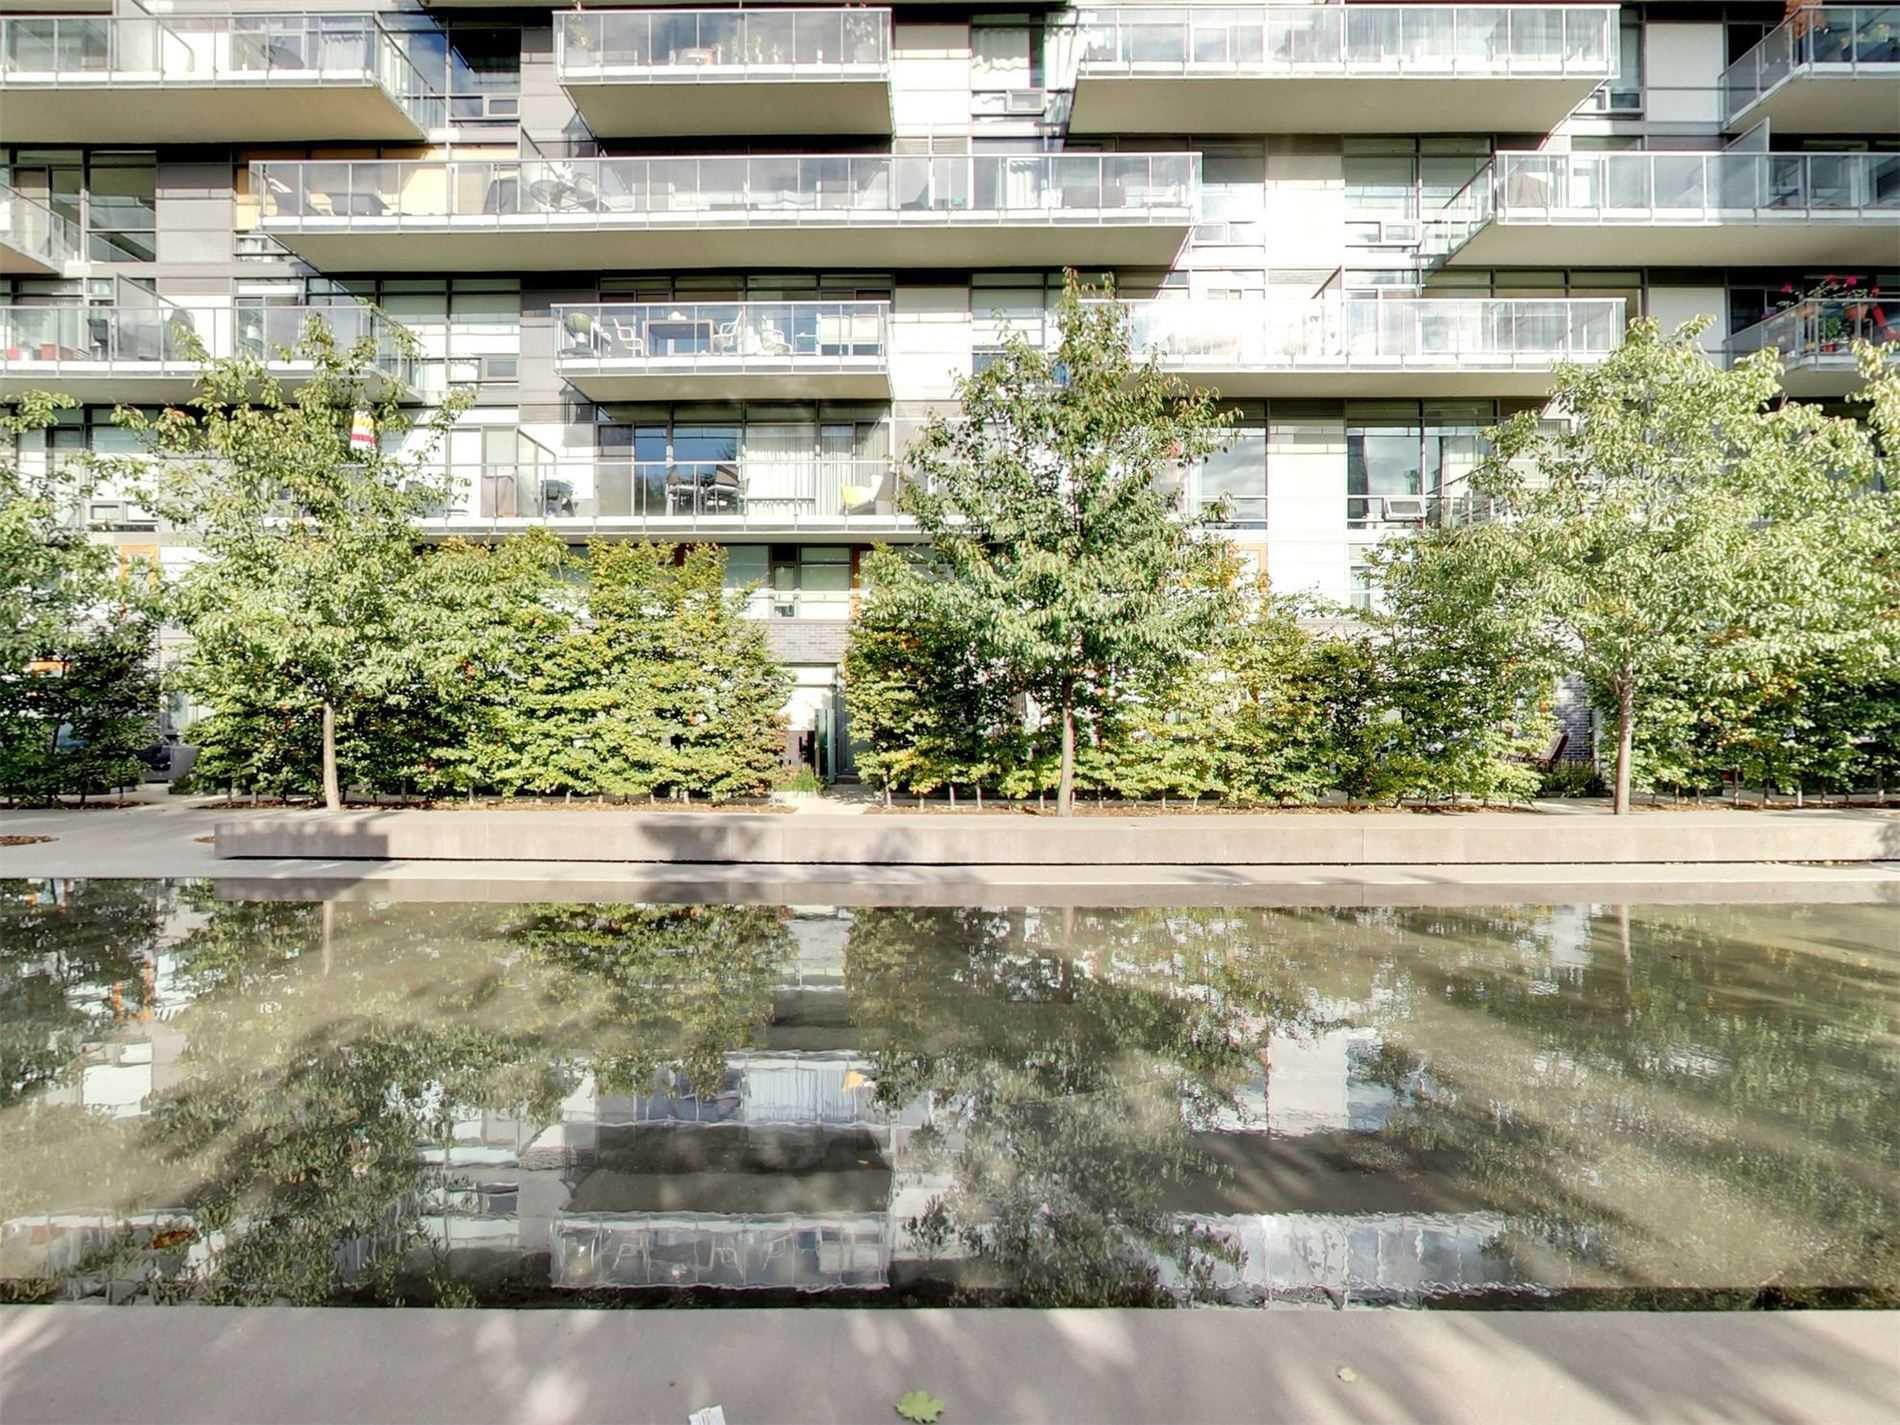 Photo 16: Photos: 818 55 Stewart Street in Toronto: Waterfront Communities C1 Condo for sale (Toronto C01)  : MLS®# C4690098